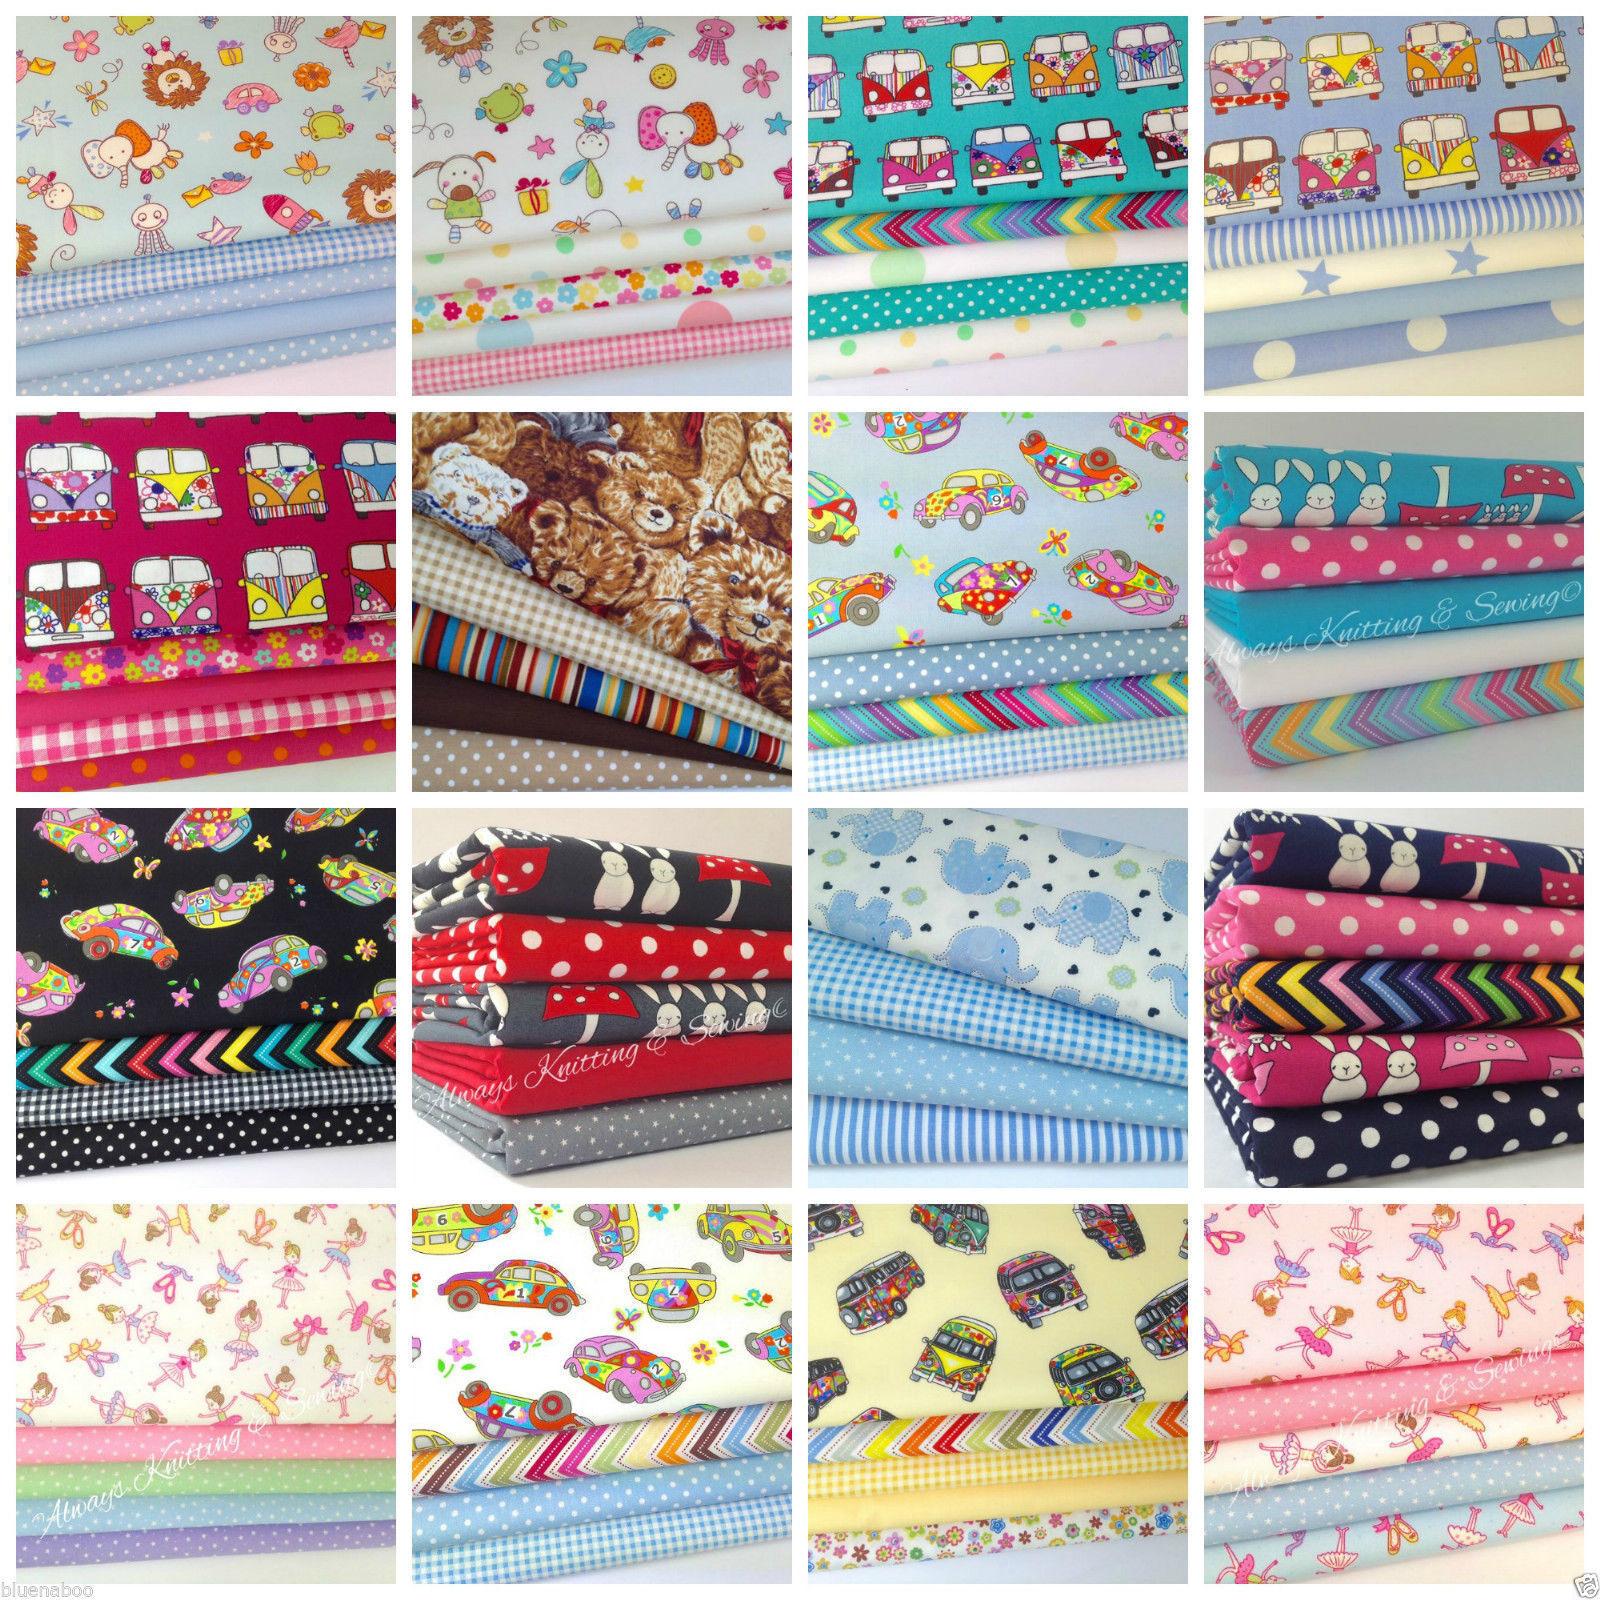 childrens/nursery themed fat quarter bundles 100 % cotton fabric